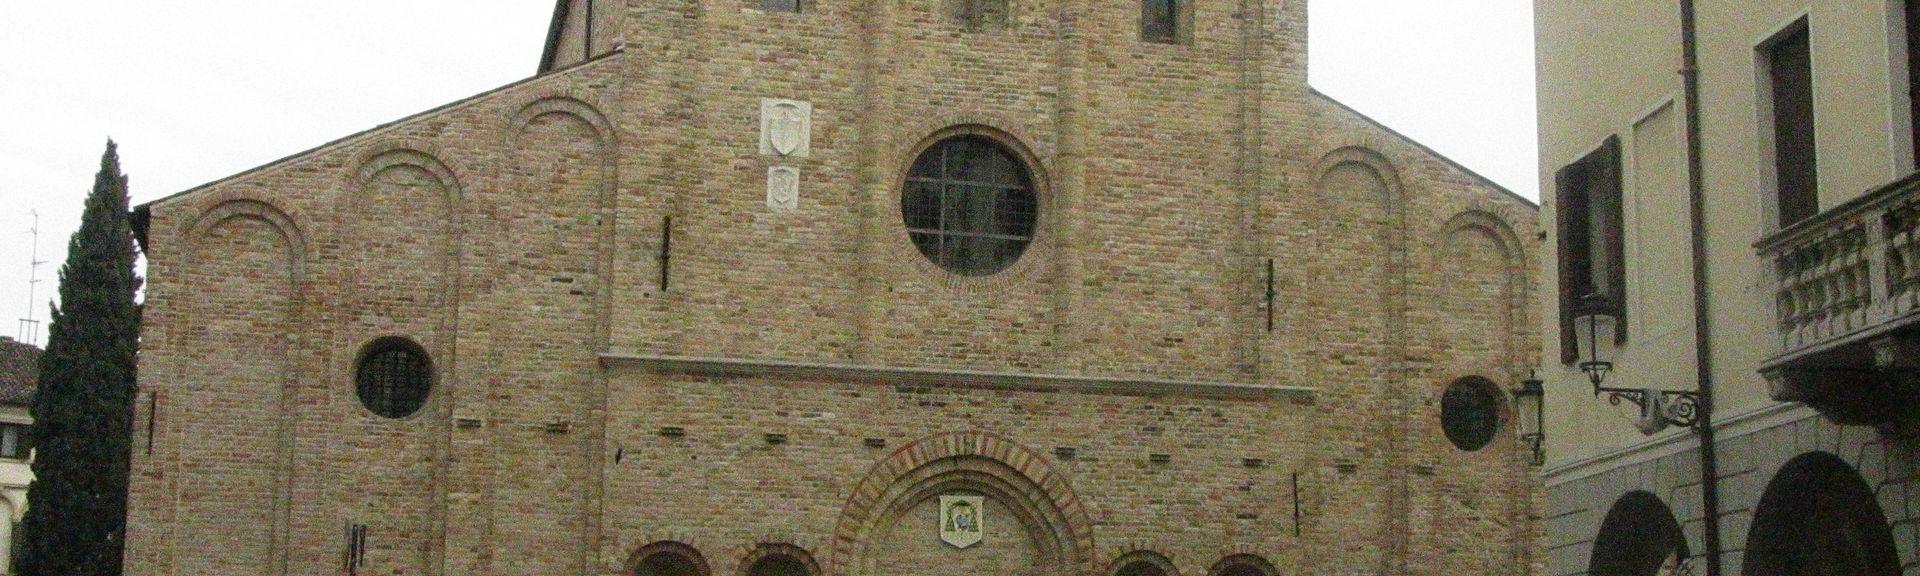 Battaglia Terme, Padua, Veneto, Italy